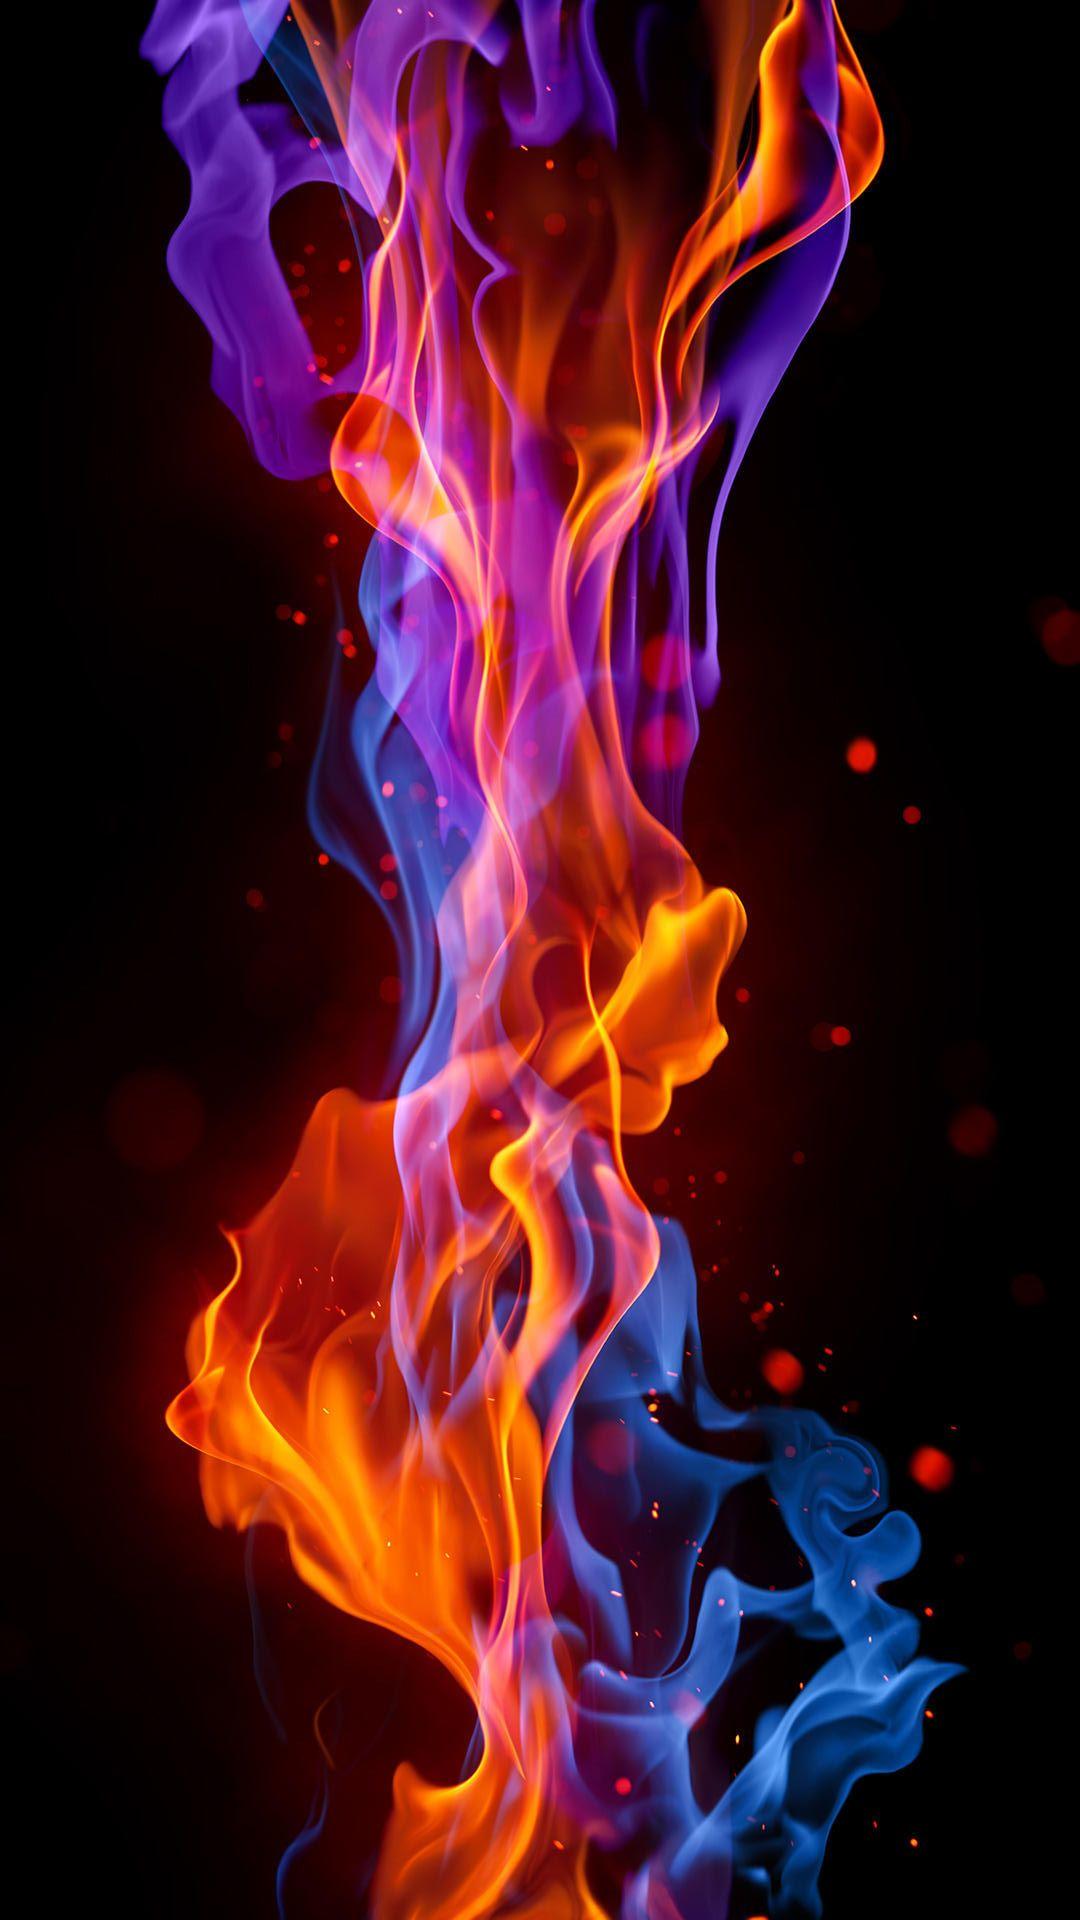 Fire Iphone Wallpaper Hd 画像あり 炎 イラスト ホーム画面